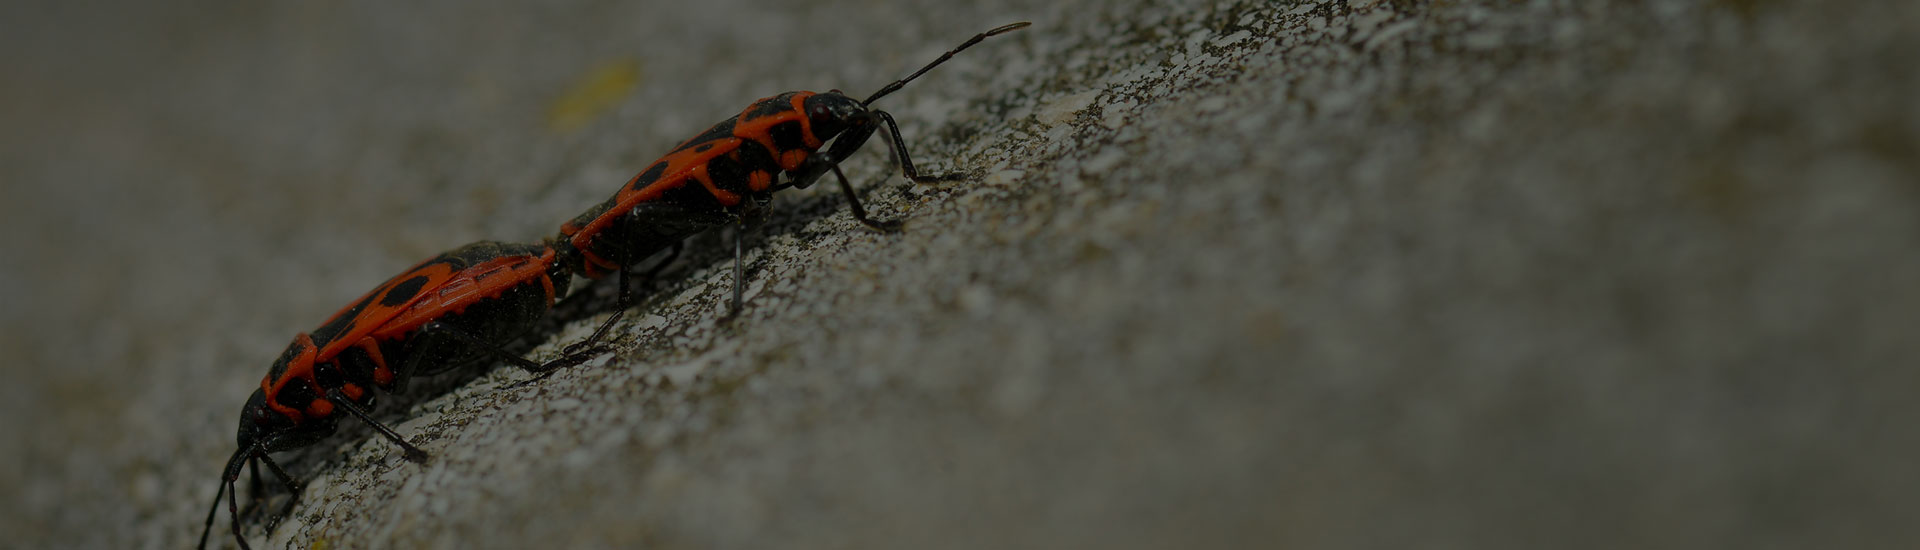 Pest Control Company Xterminator